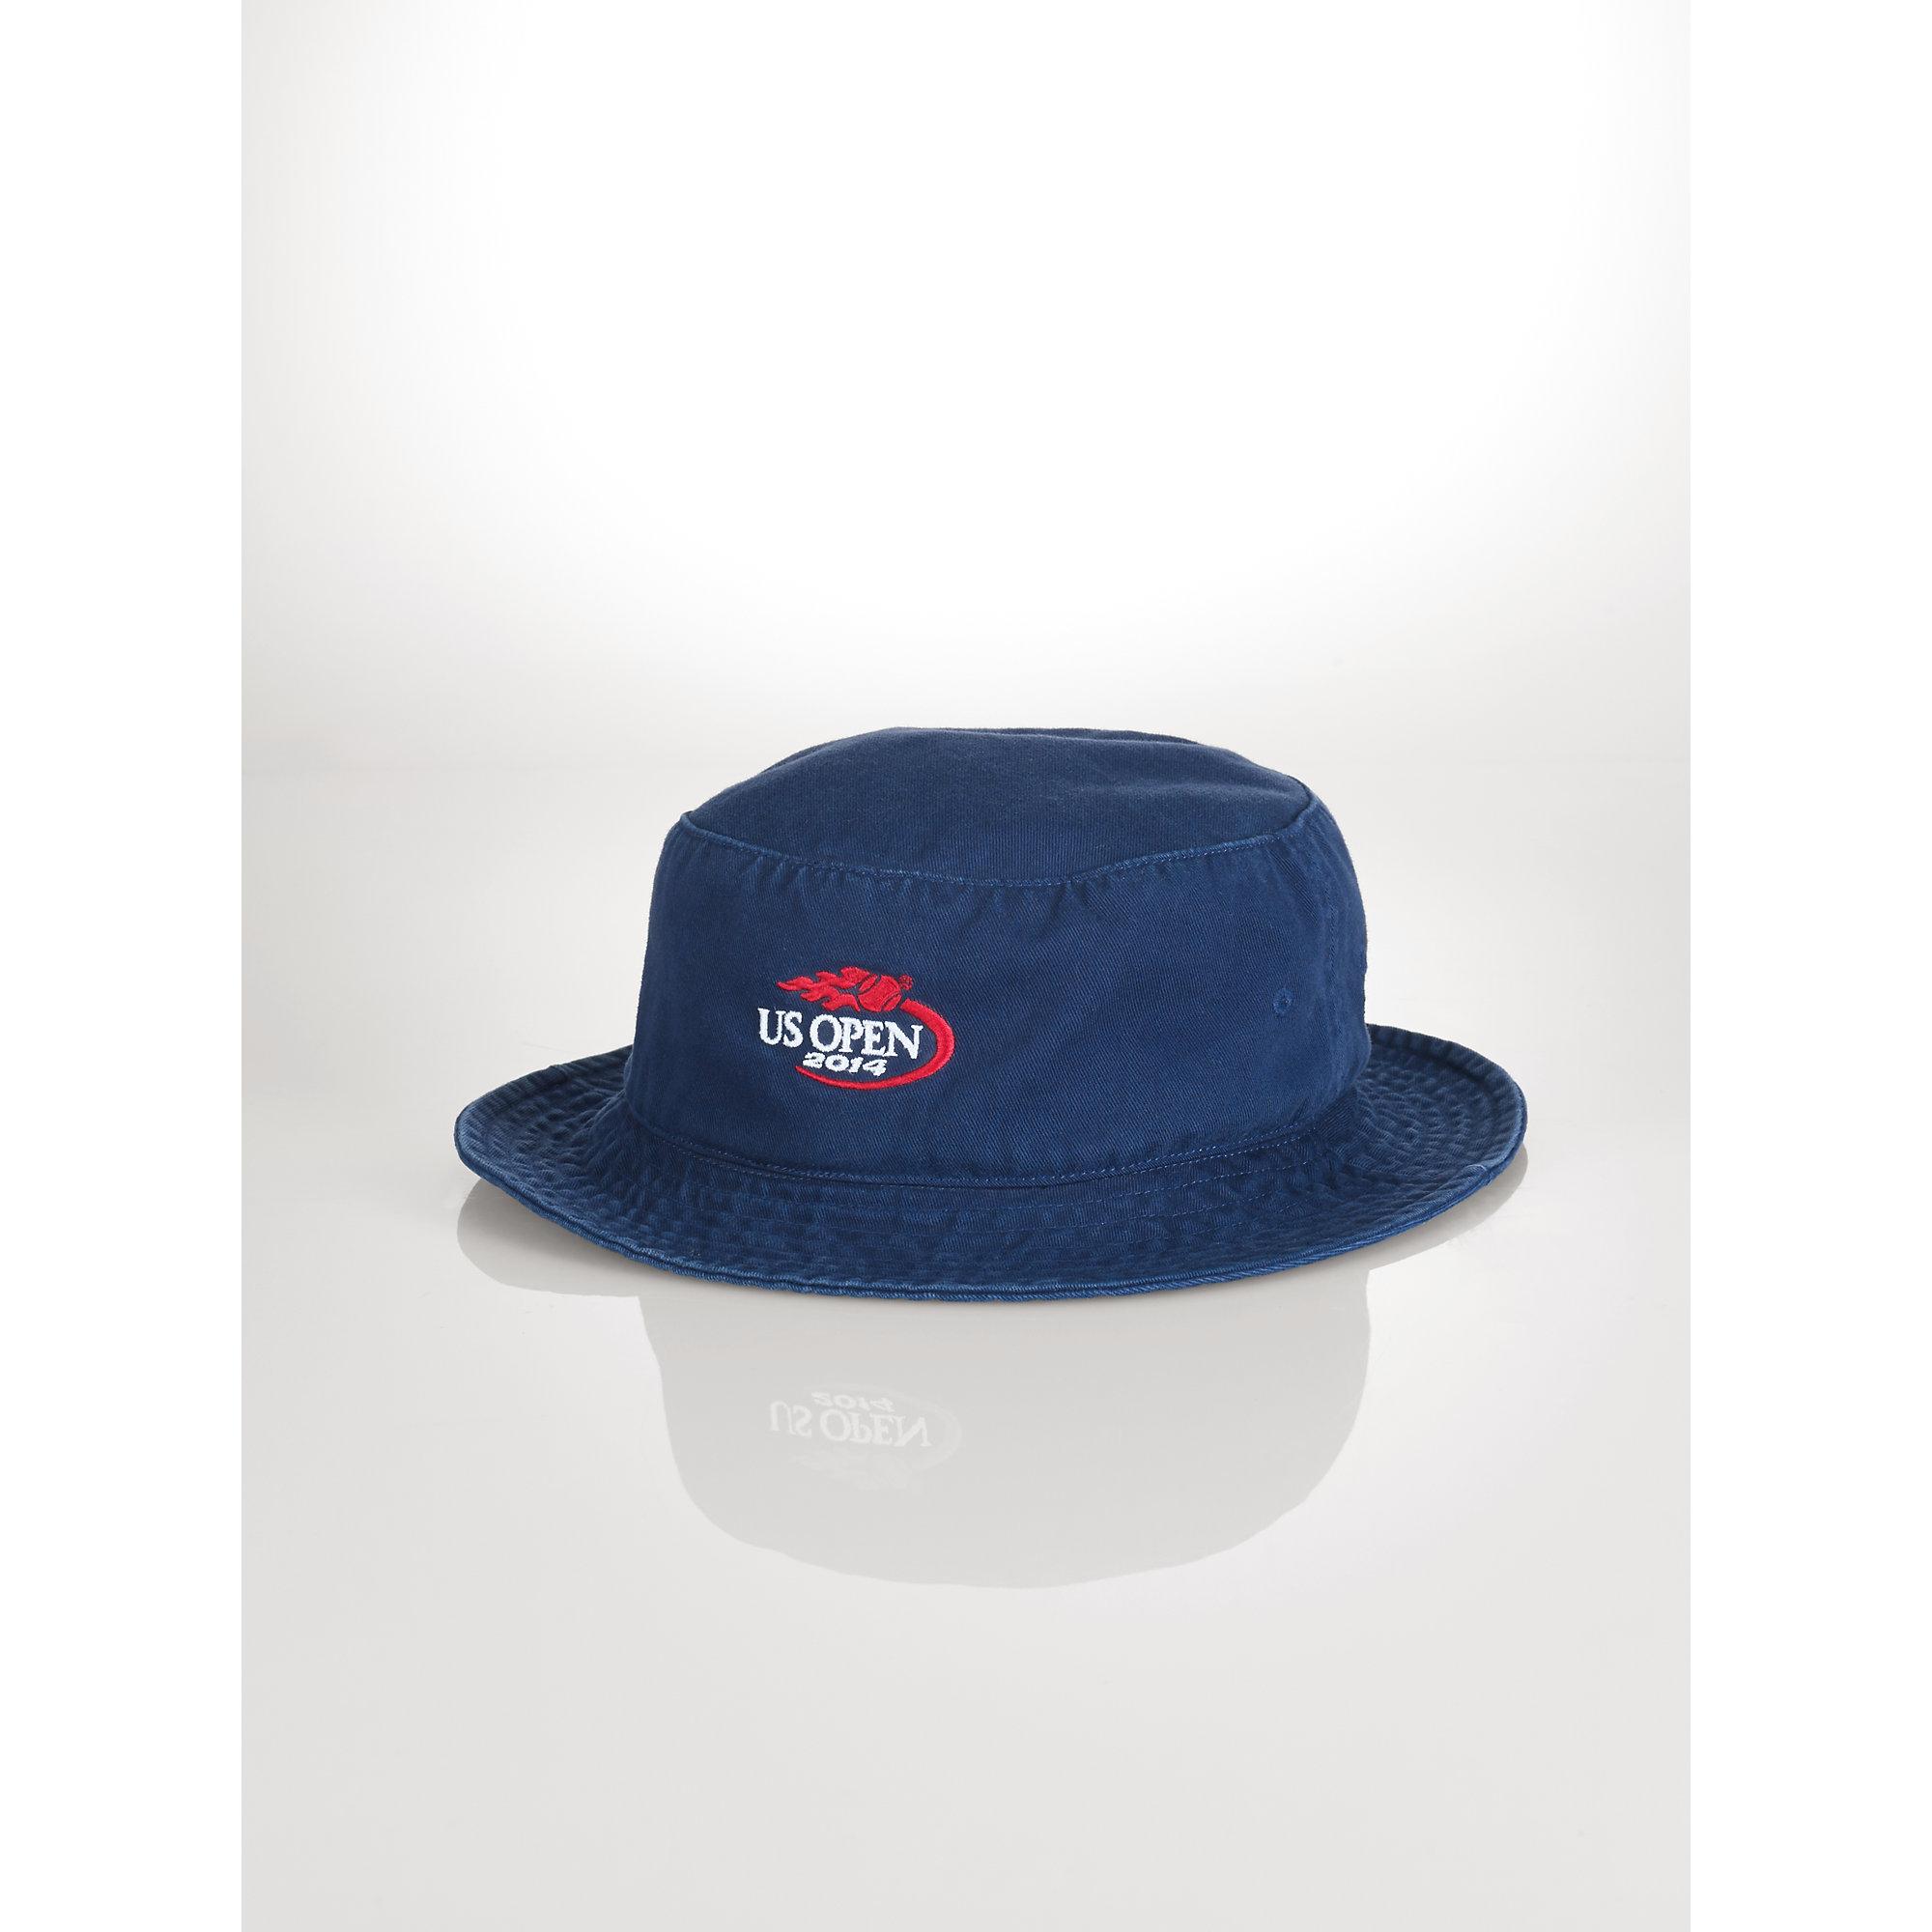 Lyst - Polo Ralph Lauren Us Open Bucket Hat in Blue for Men c7b4c90094ff